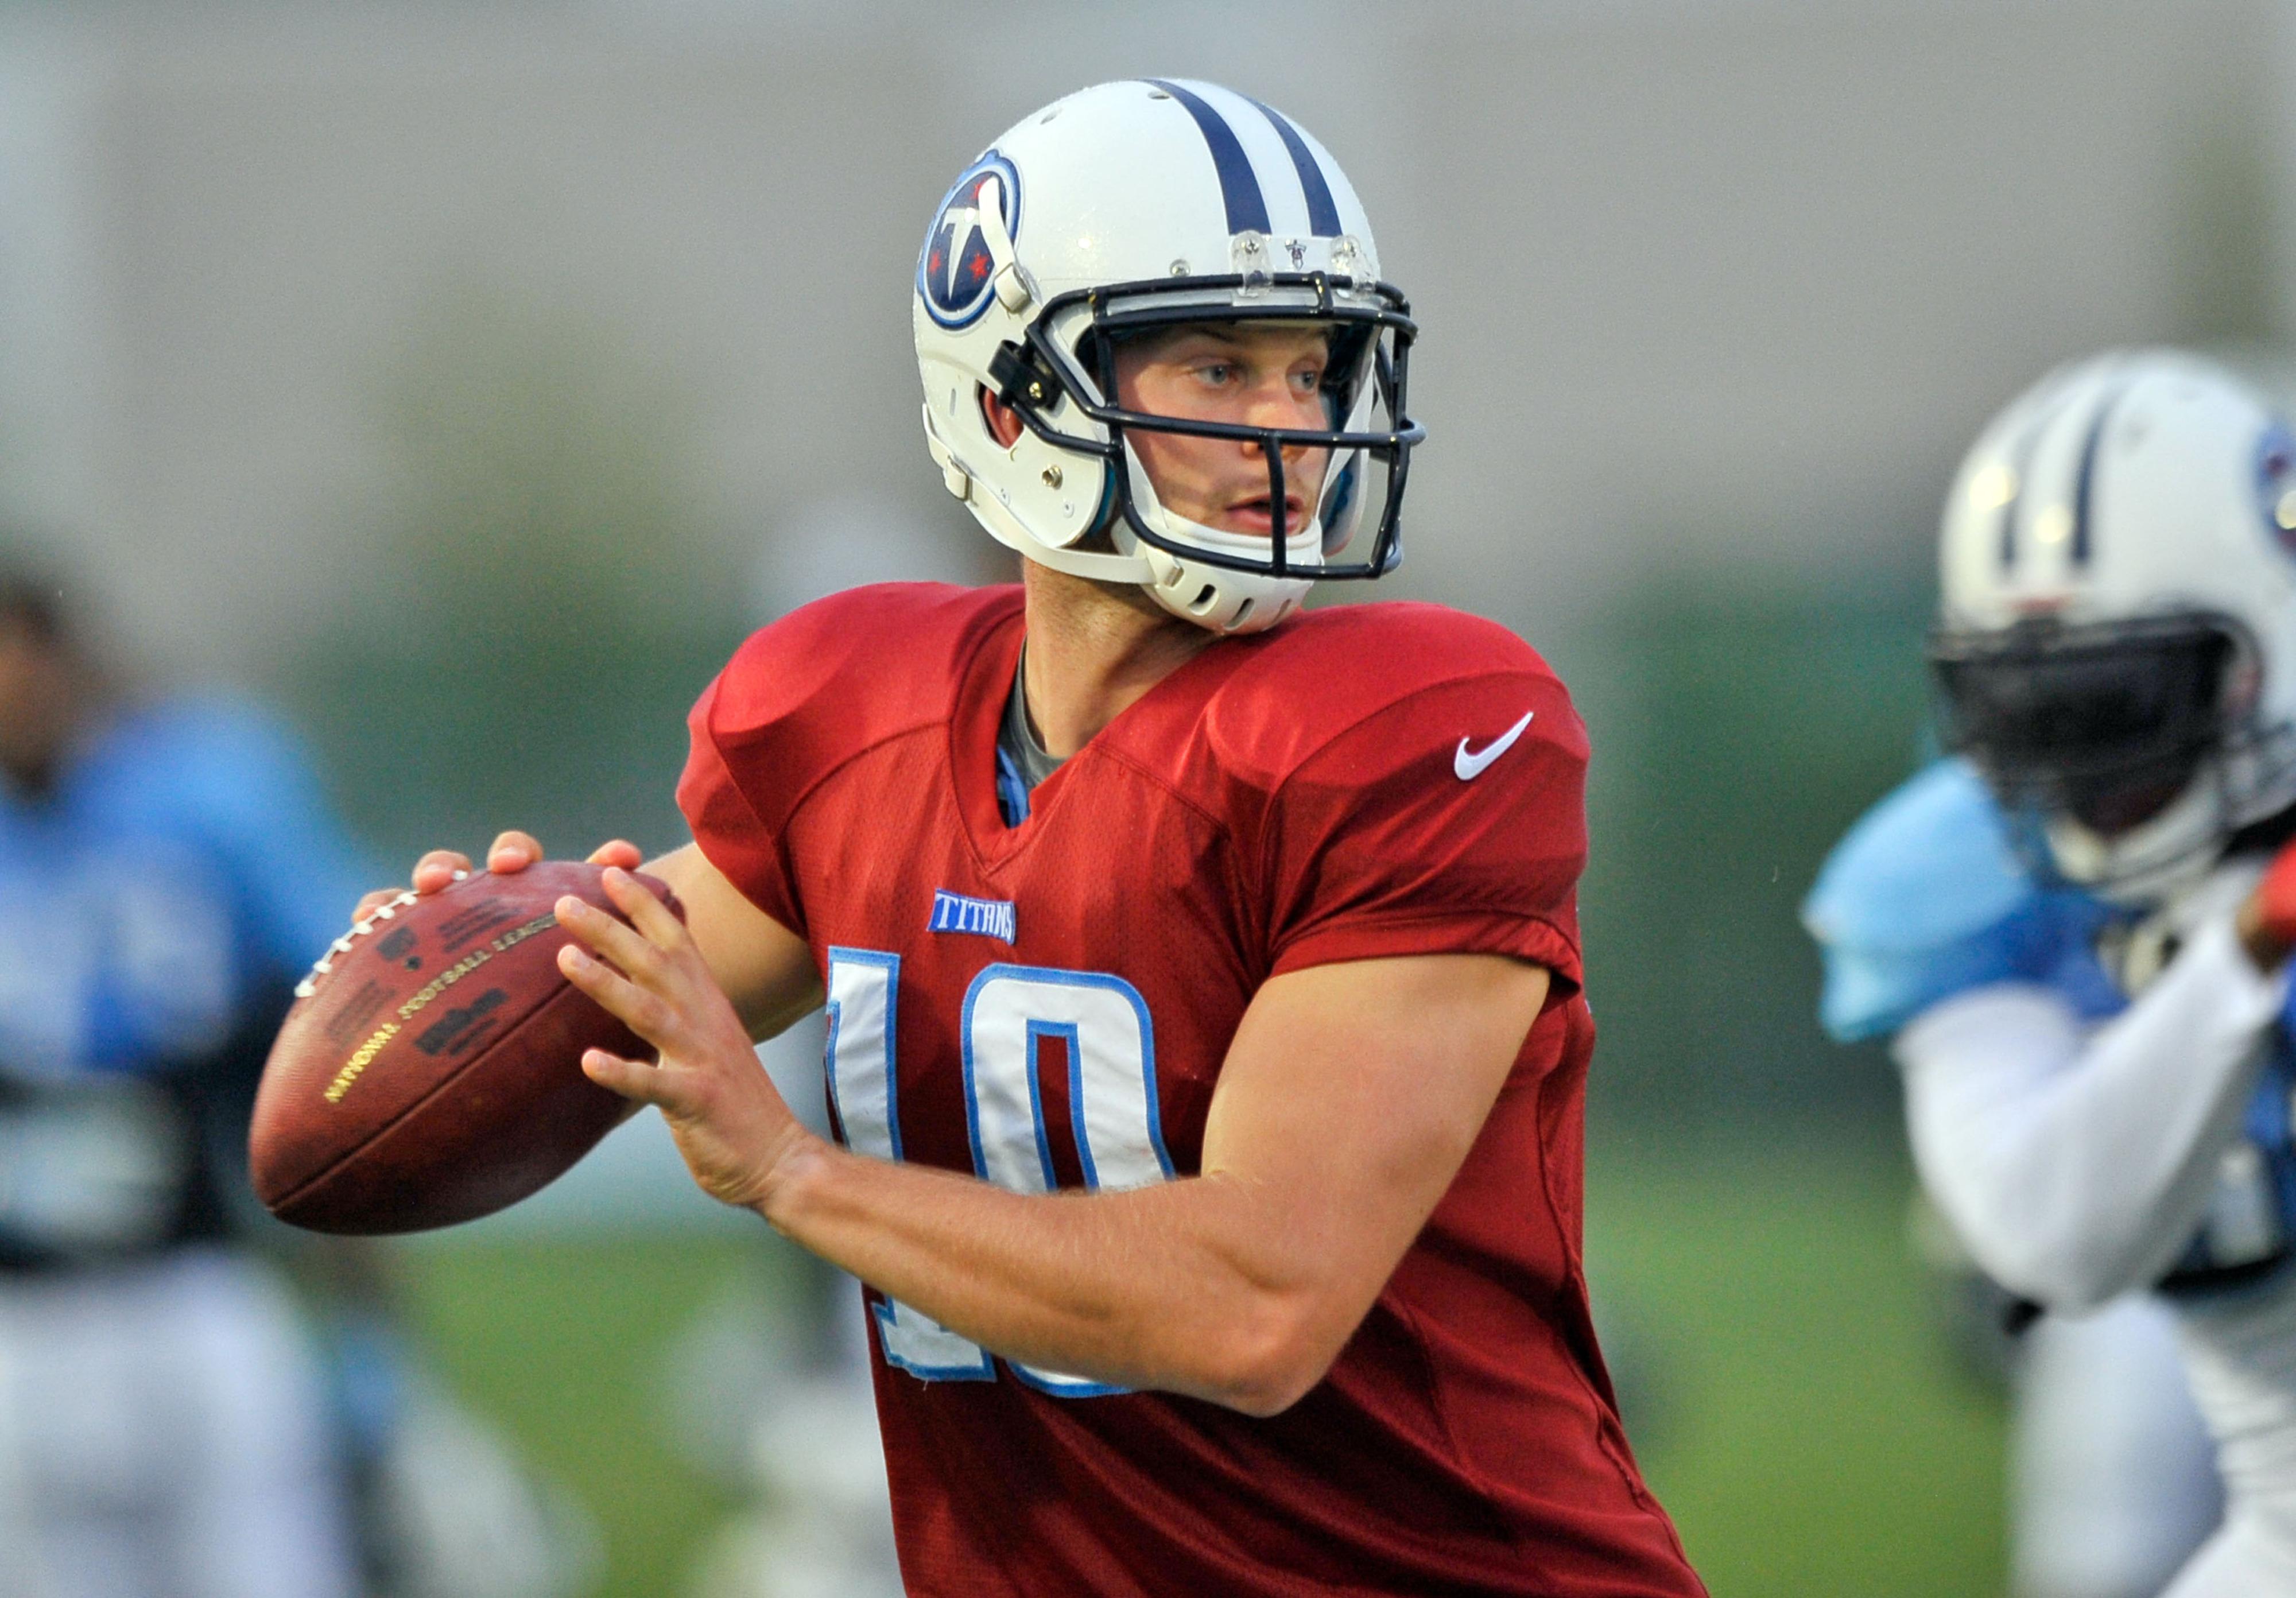 Titans Quarterback Jake Locker throws a pass during training camp